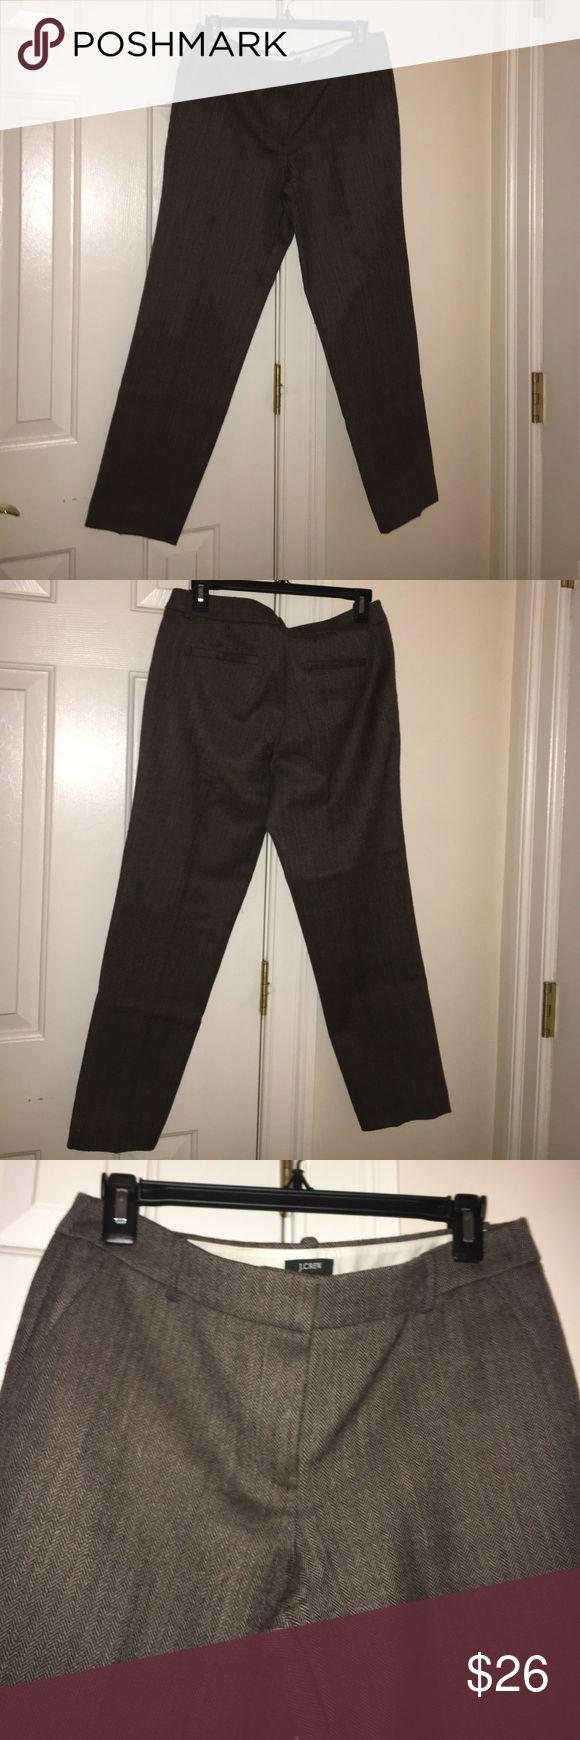 "J Crew dress trousers ""City fit"" dress pants from J Crew size 4. Pants Trousers"